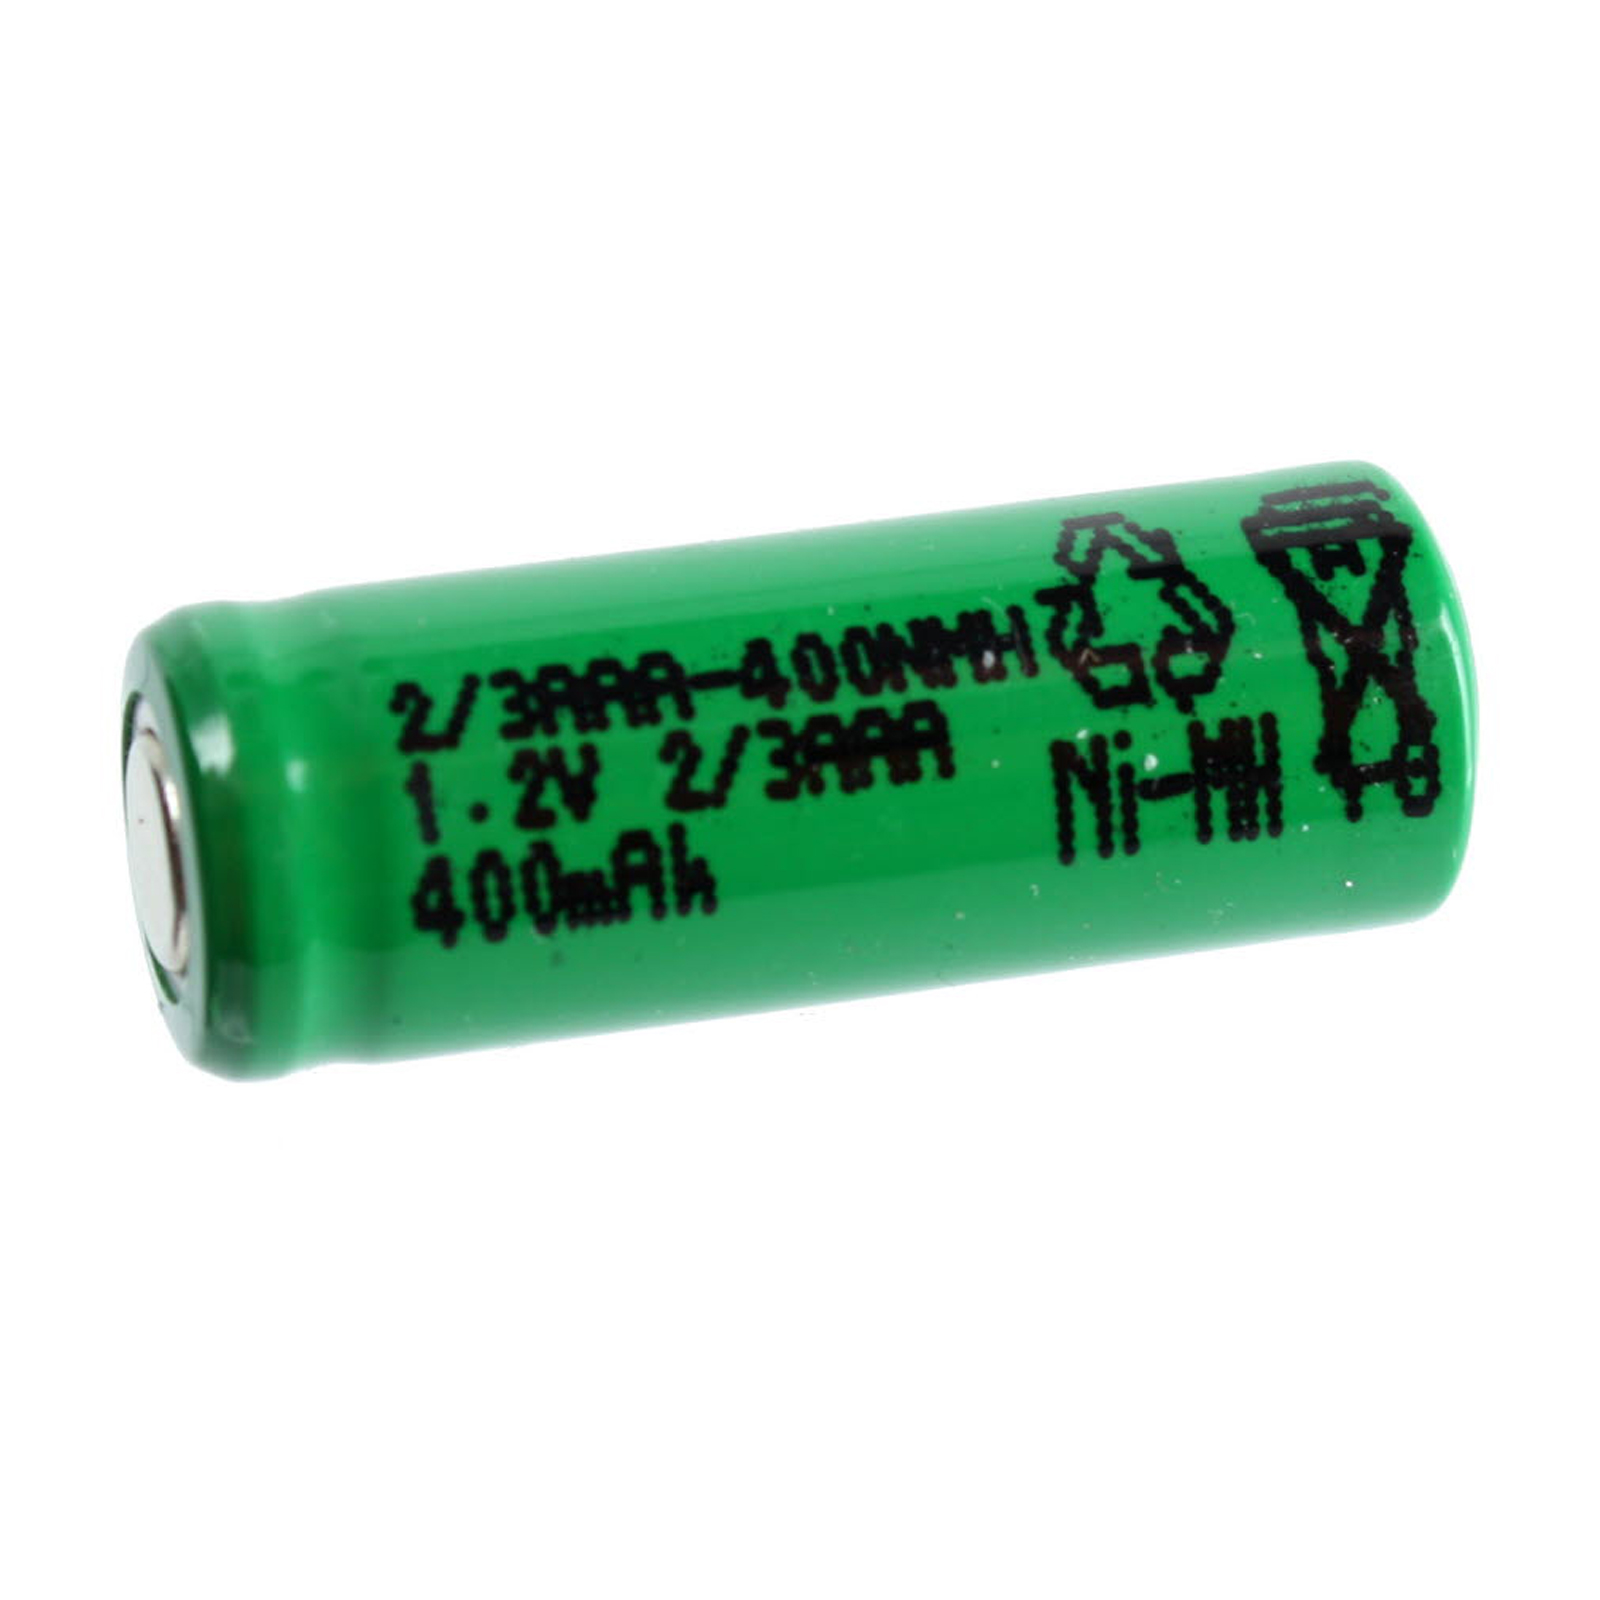 Rechargeable batteries 400mah power bank